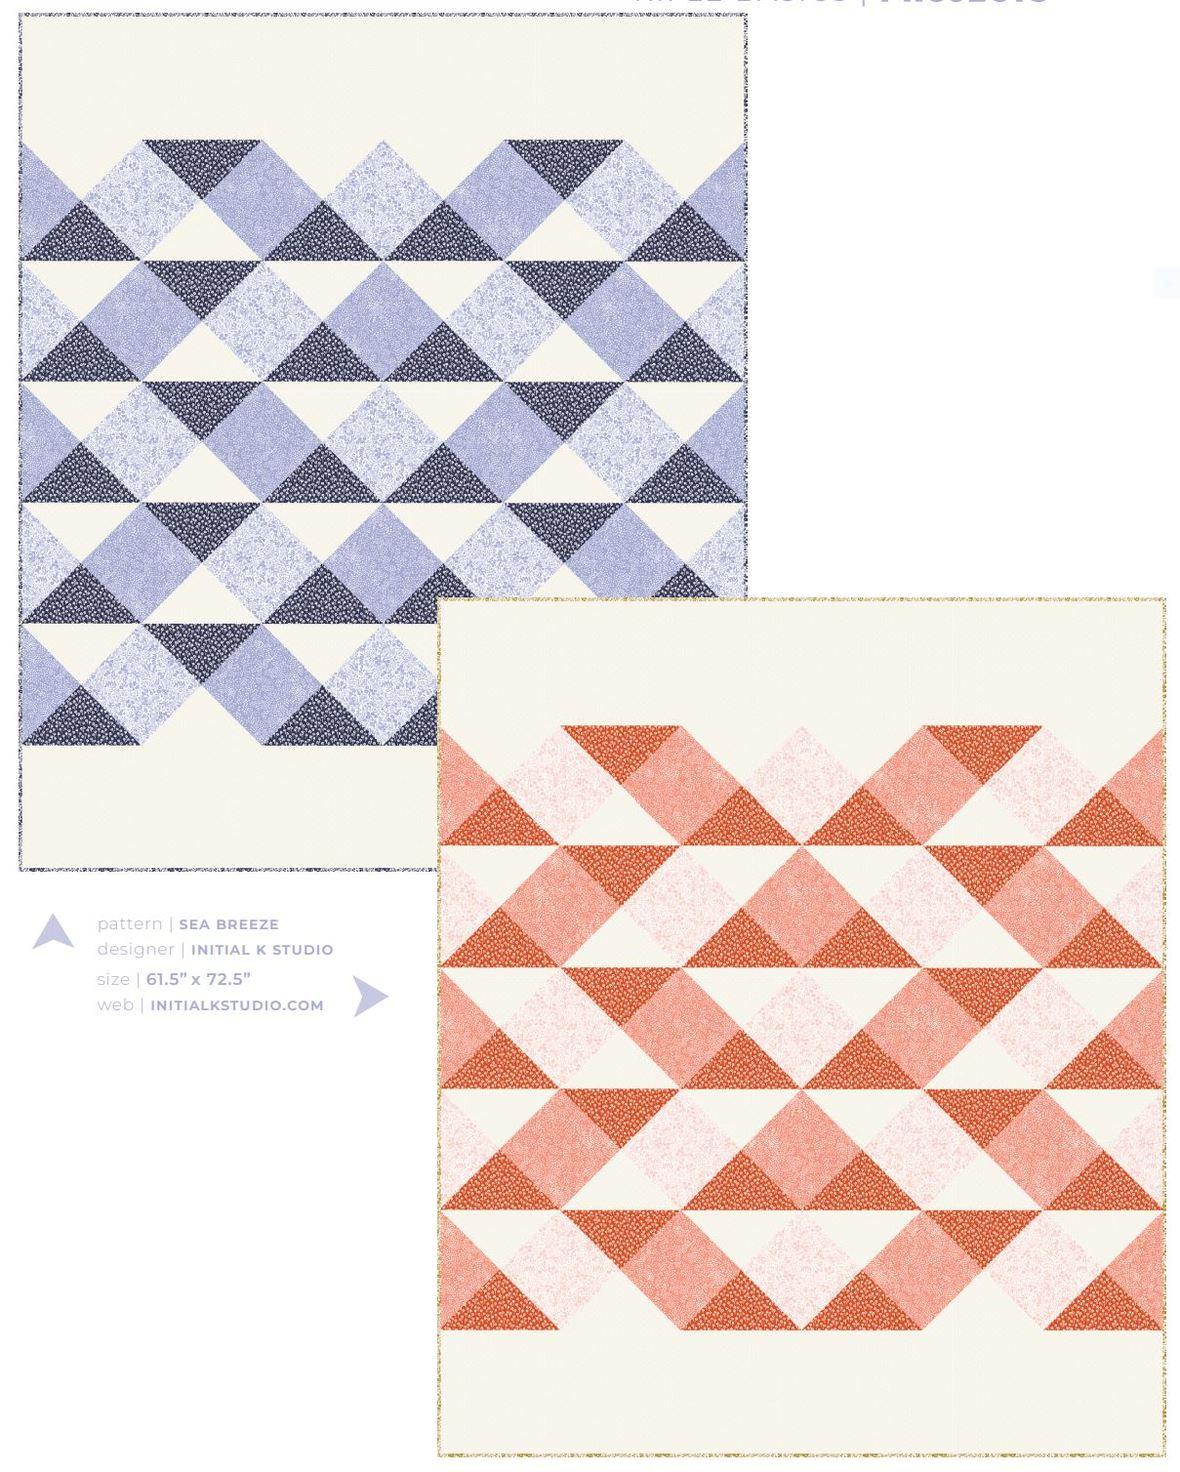 Catalog Basics Quilt 2 and 3